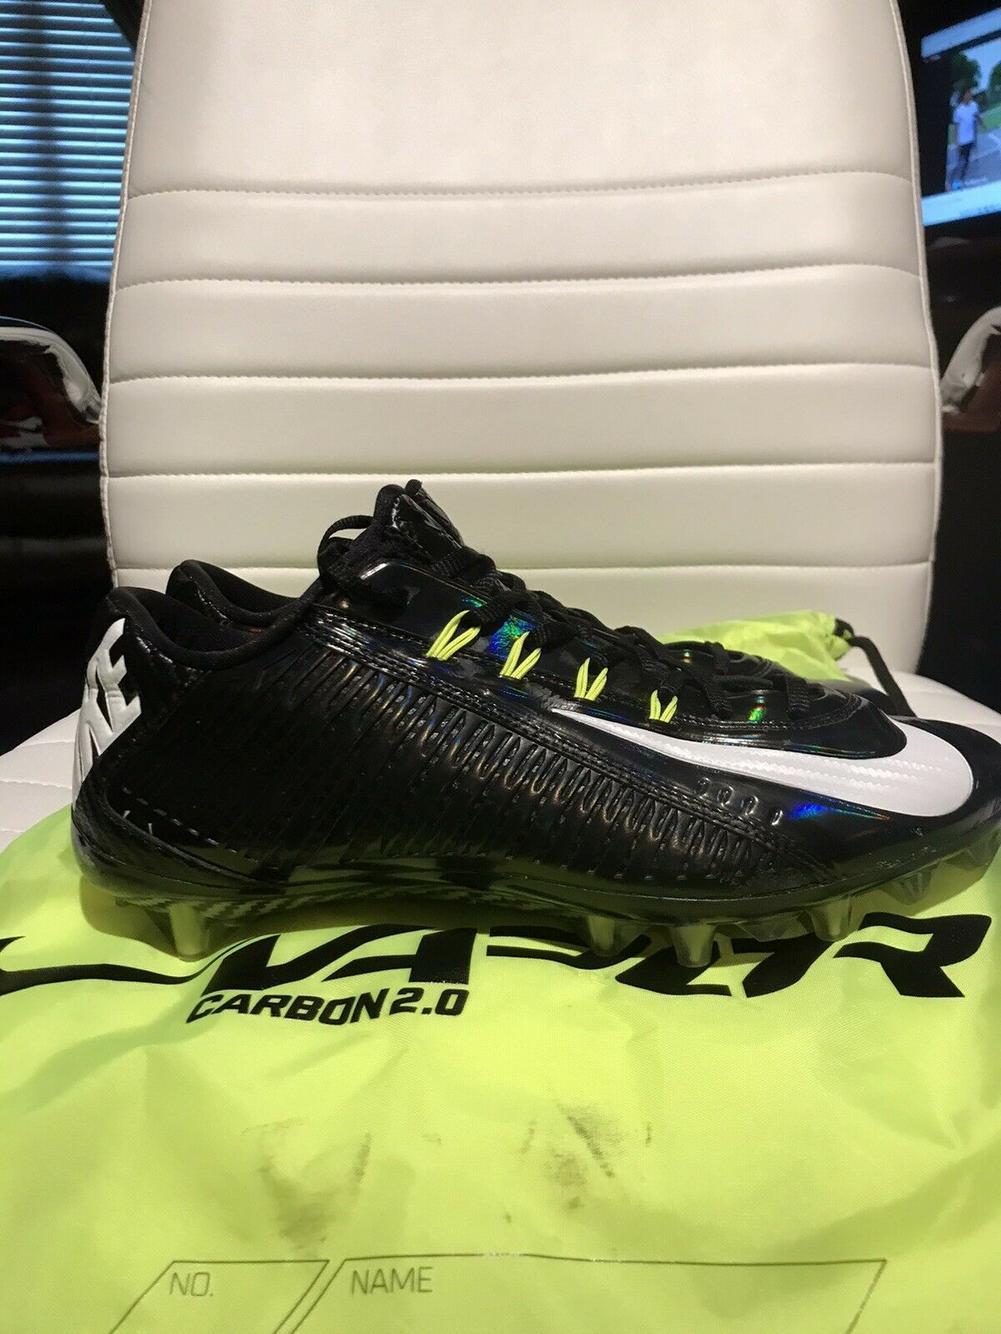 Nike Mens Vapor Carbon Elite 2.0 TD Low